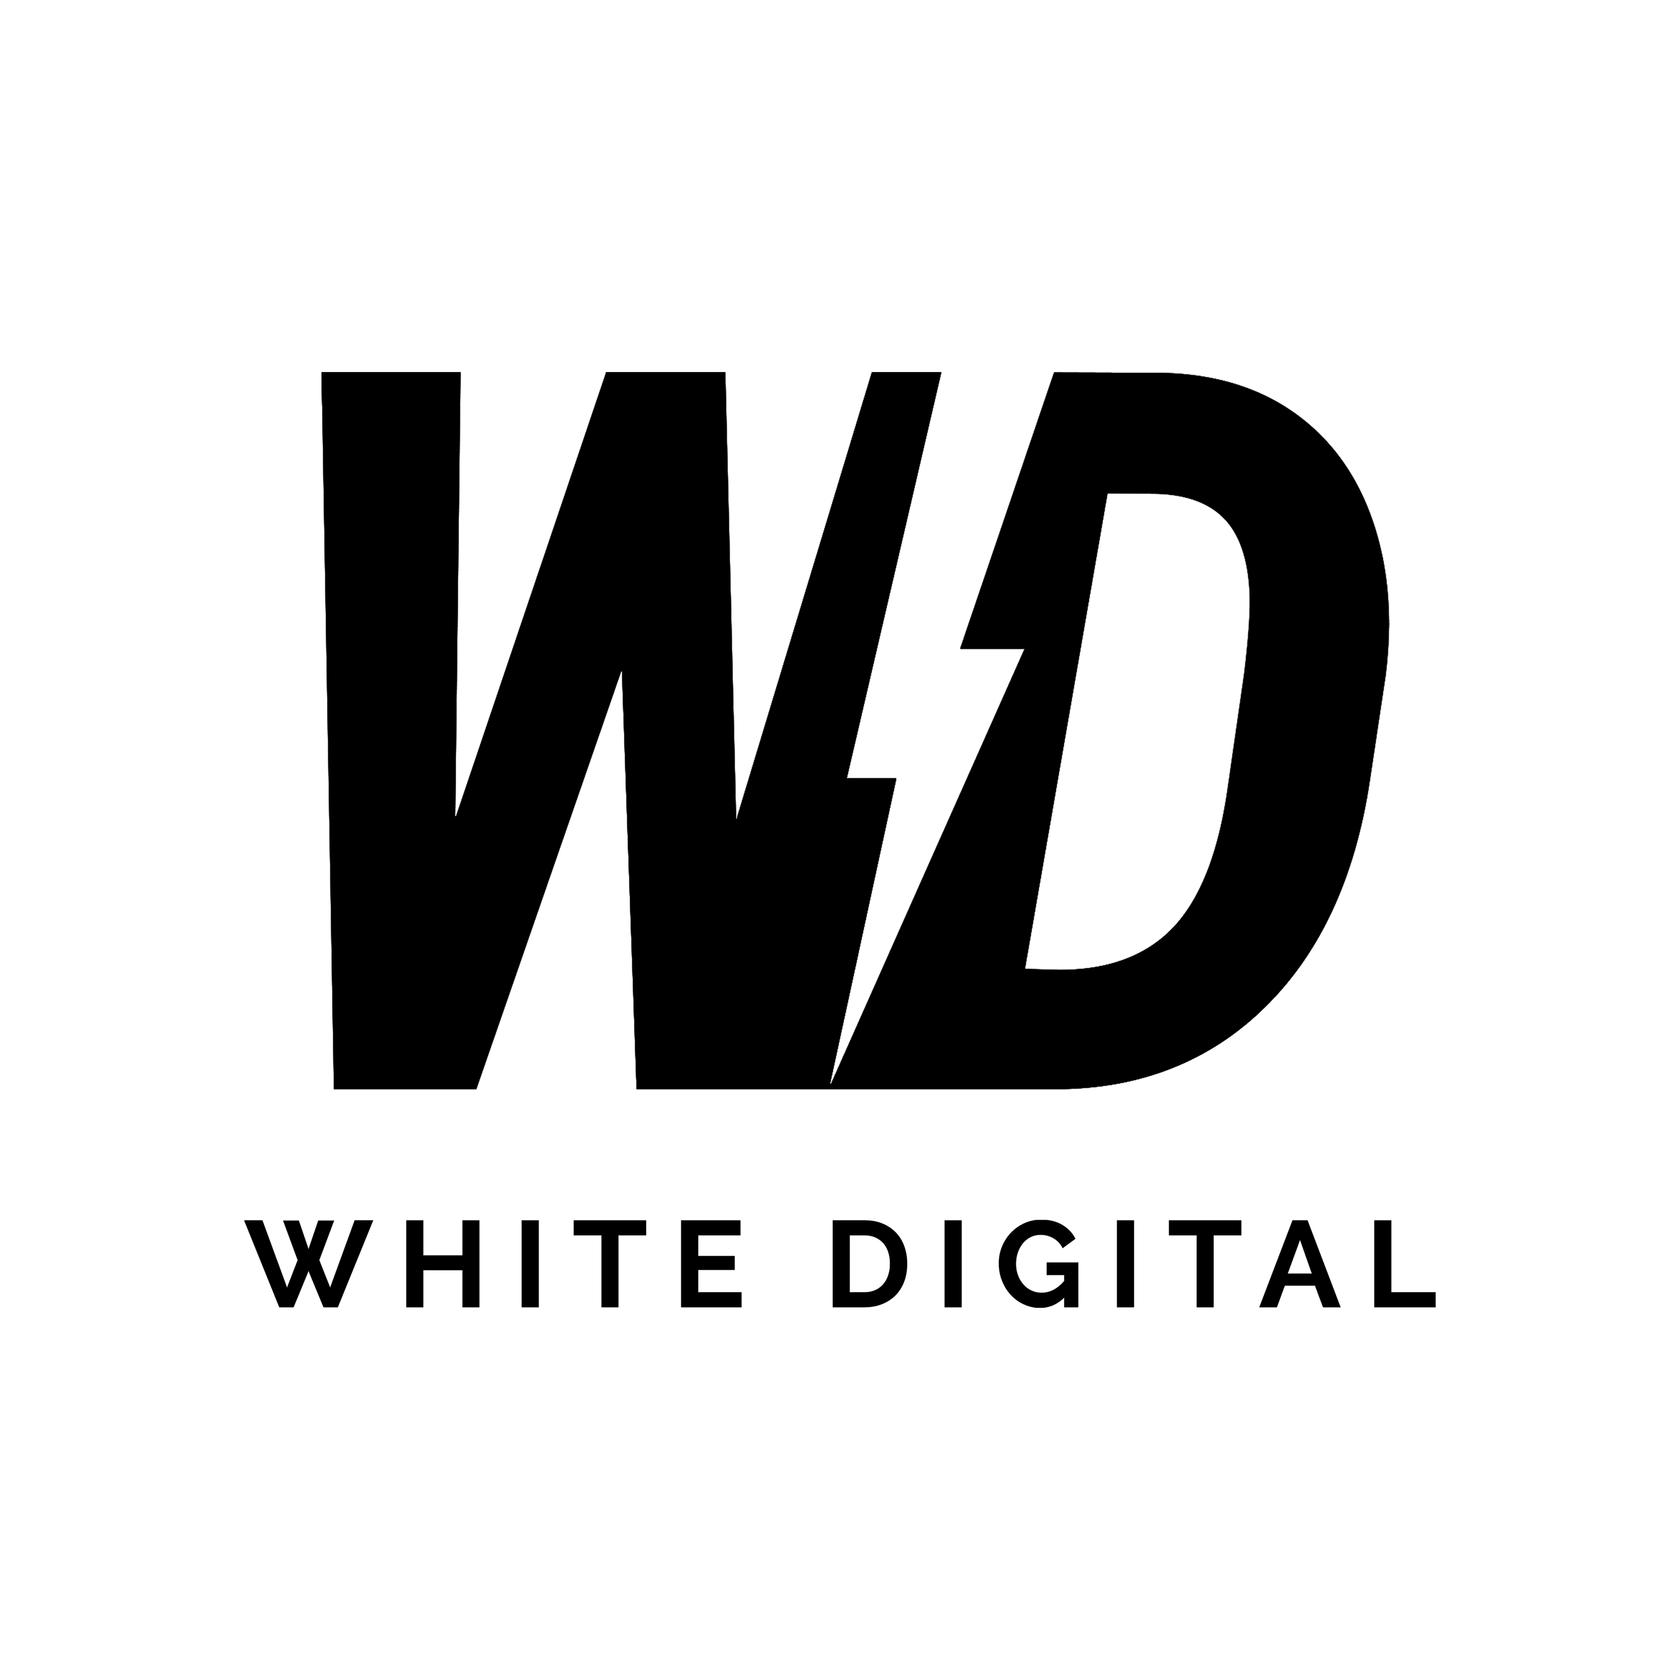 WhiteDigital